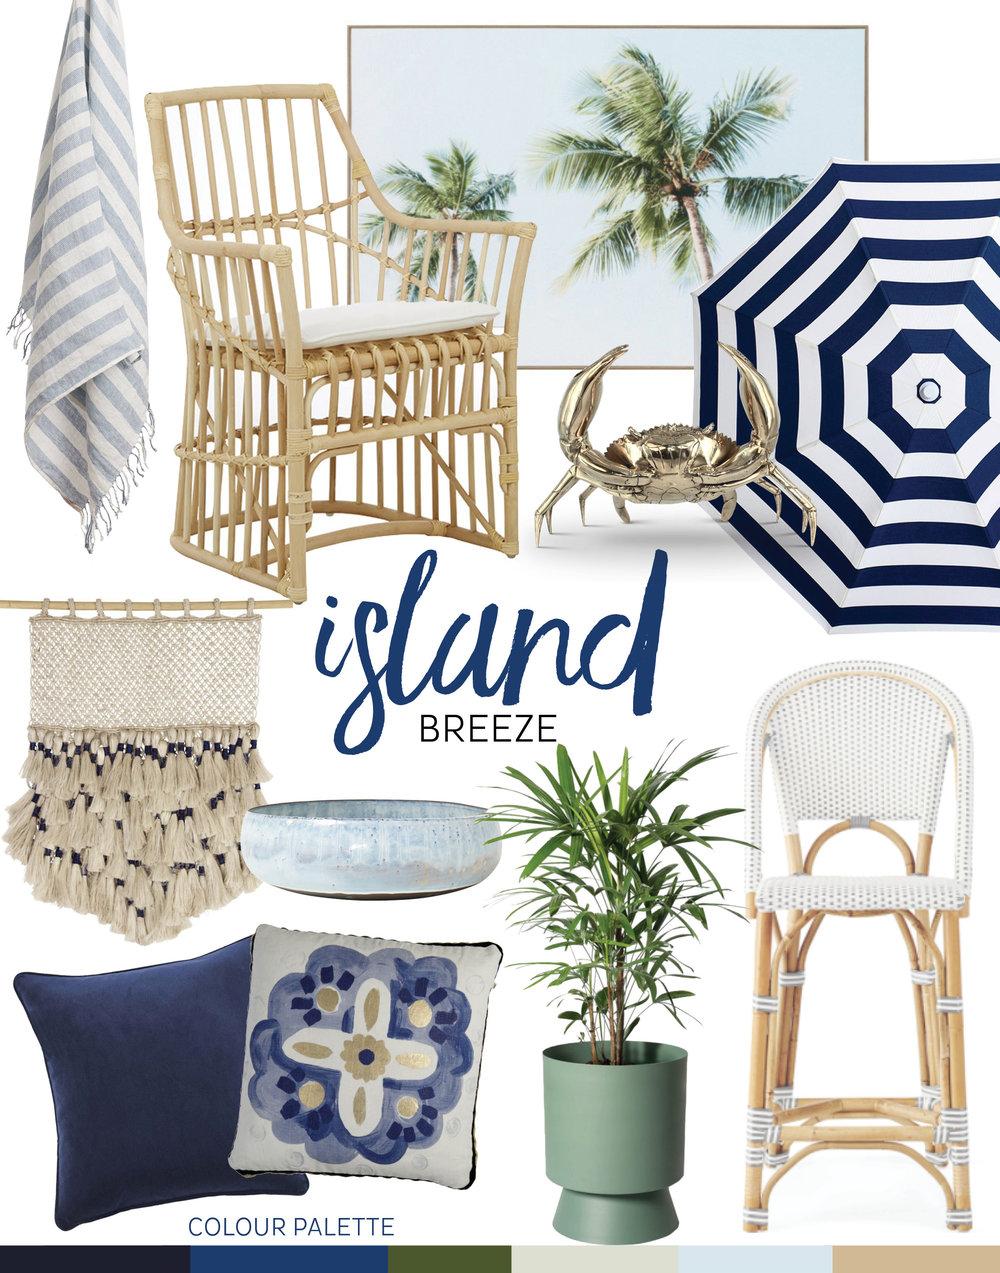 new_adore_home_magazine_blog_island_breeze_coastal_hamptons_style_homewares.jpg